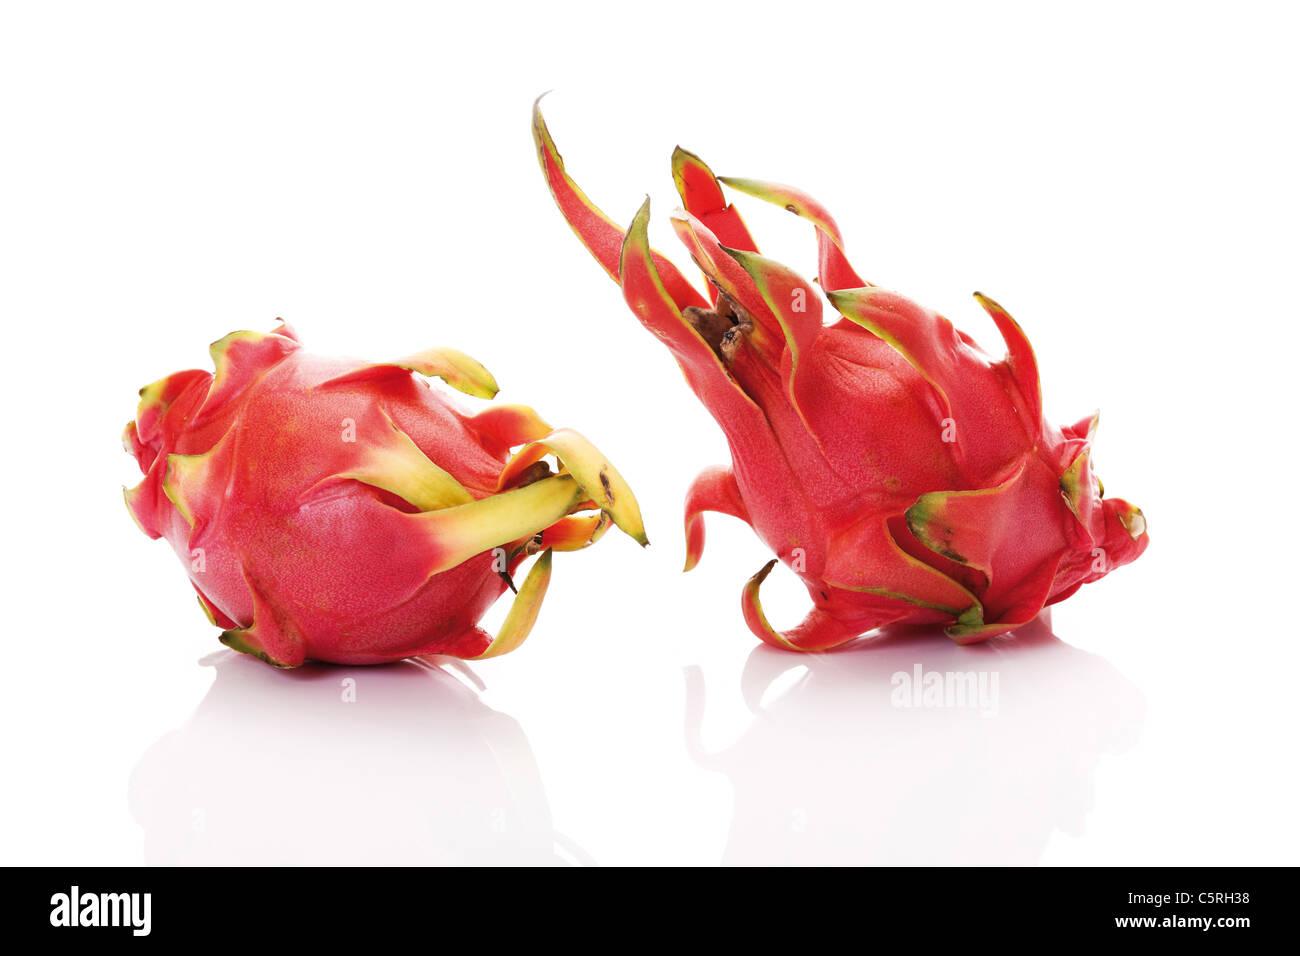 Dragon fruits (Hylocereus undatus) - Stock Image